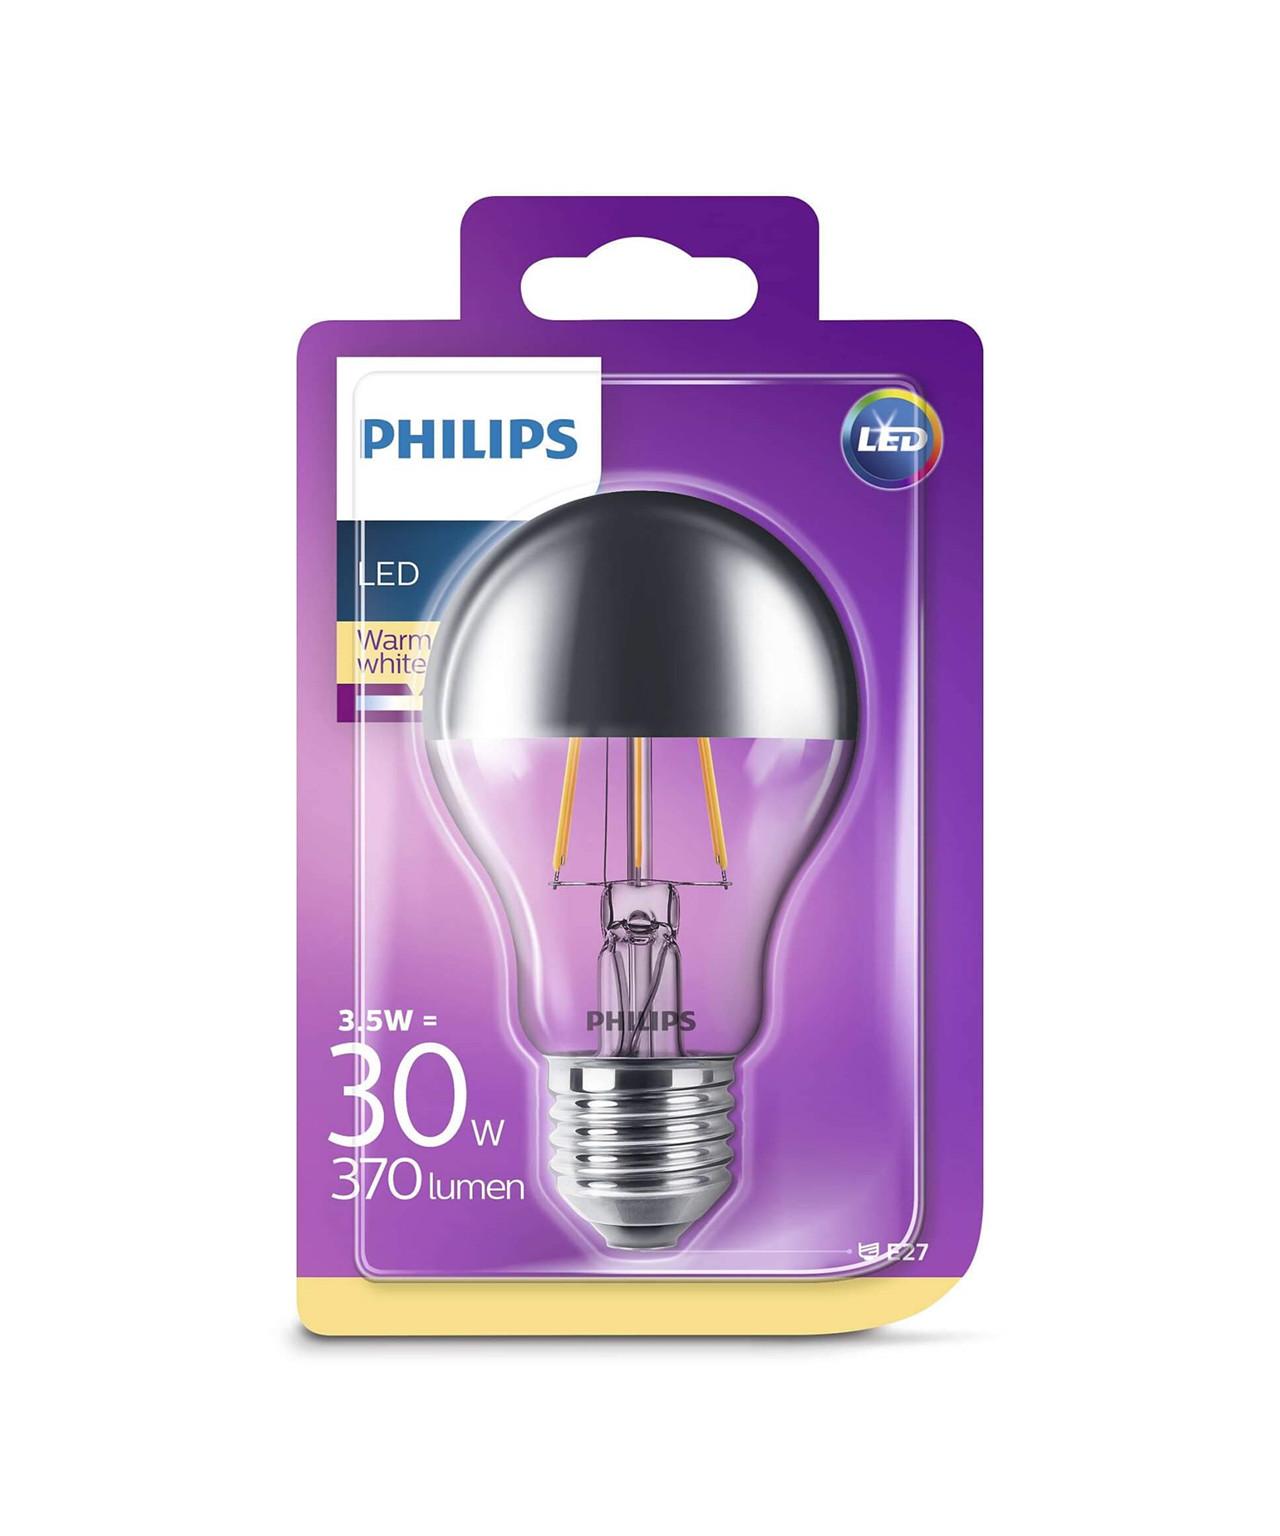 Pære LED 3,5W Filament Topforspejlet (370lm) E27 - Philips